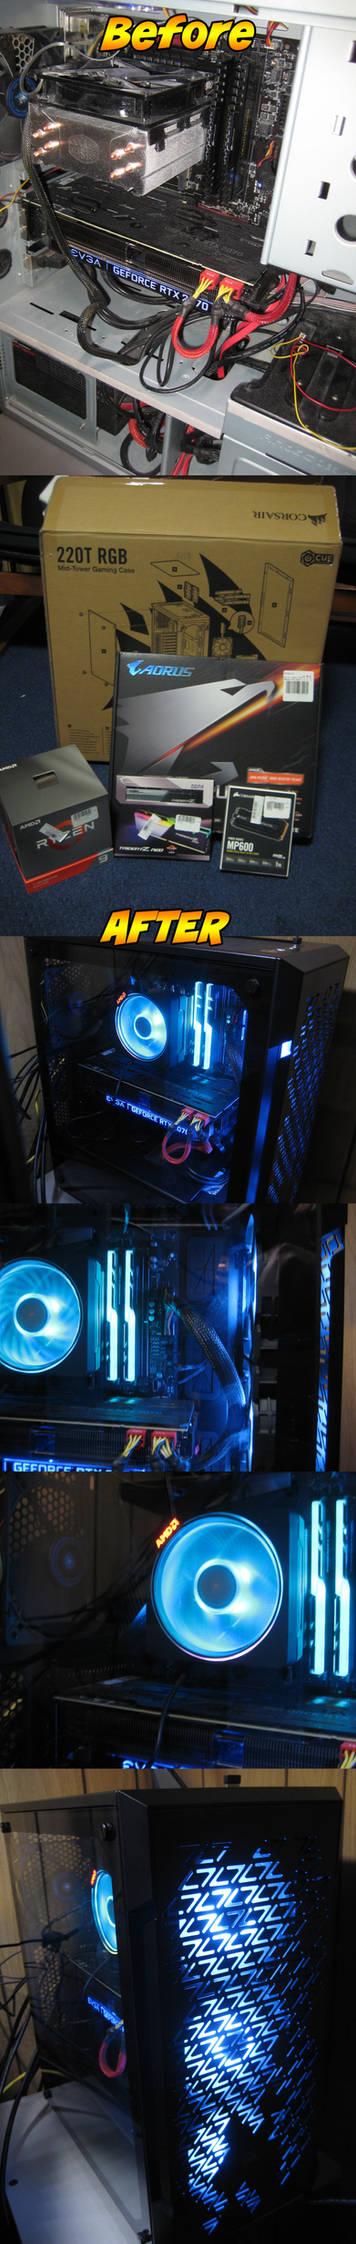 PC upgrade 2020 edition!